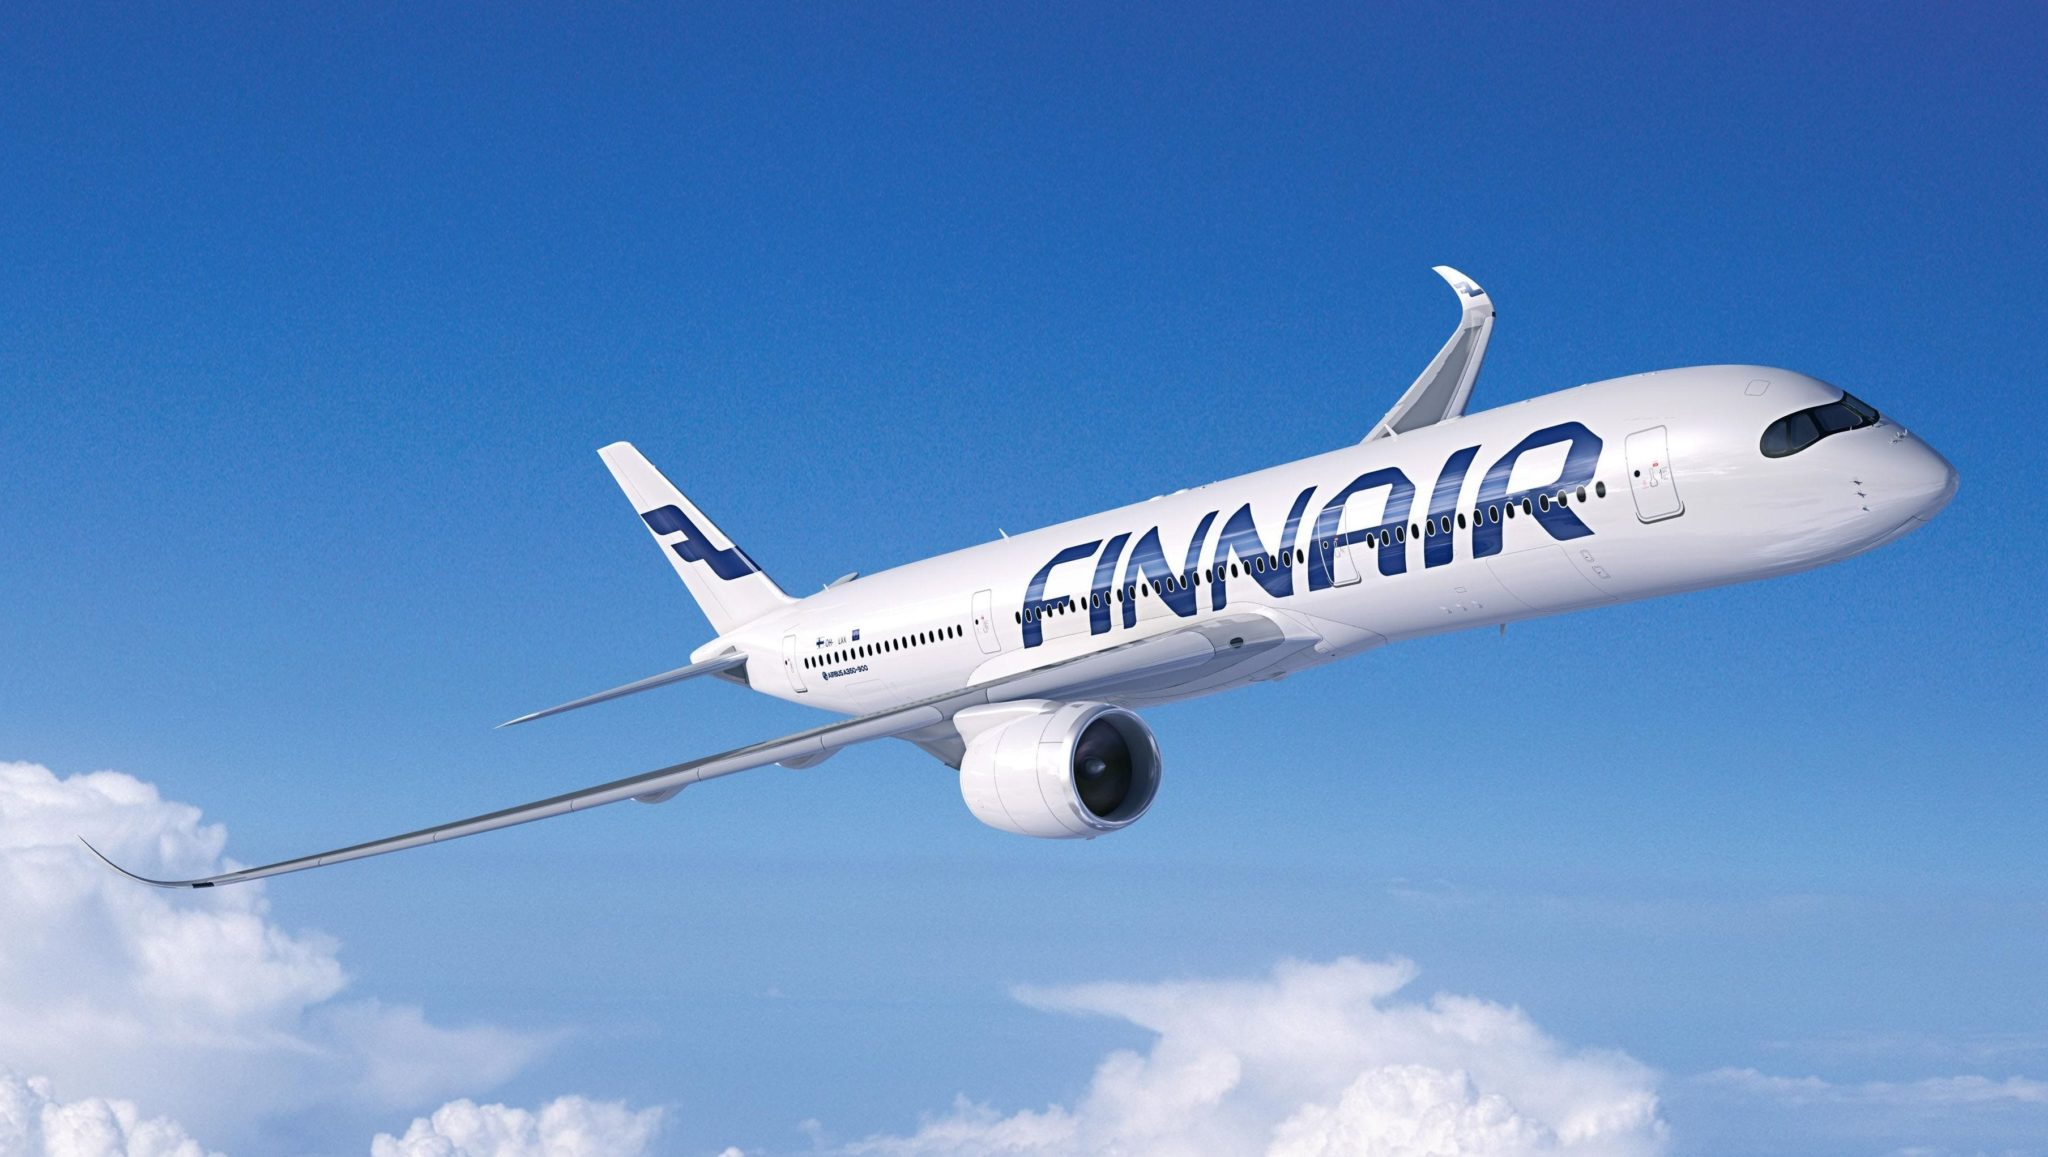 finnair-sky